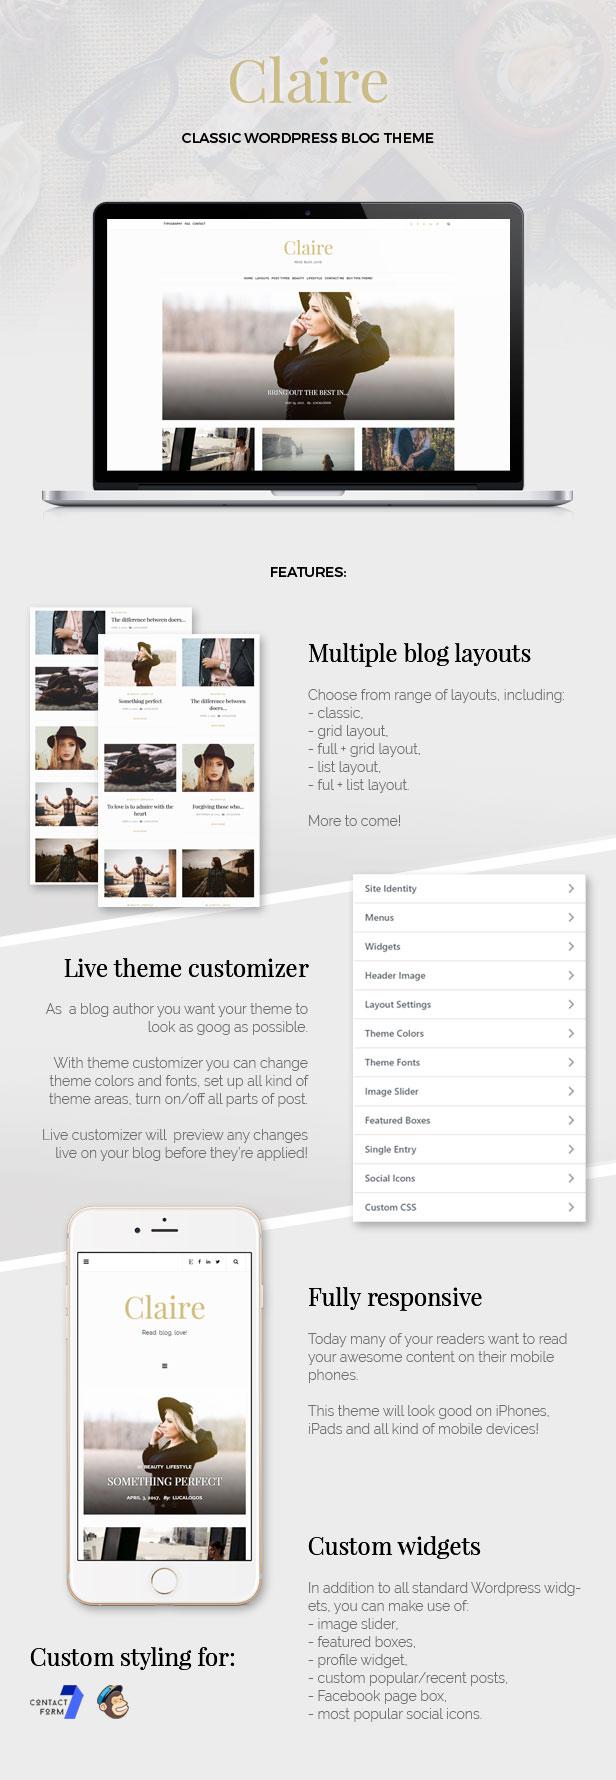 Claire - Classic WordPress Blog Theme - wordpress, themeforest, blog-magazine